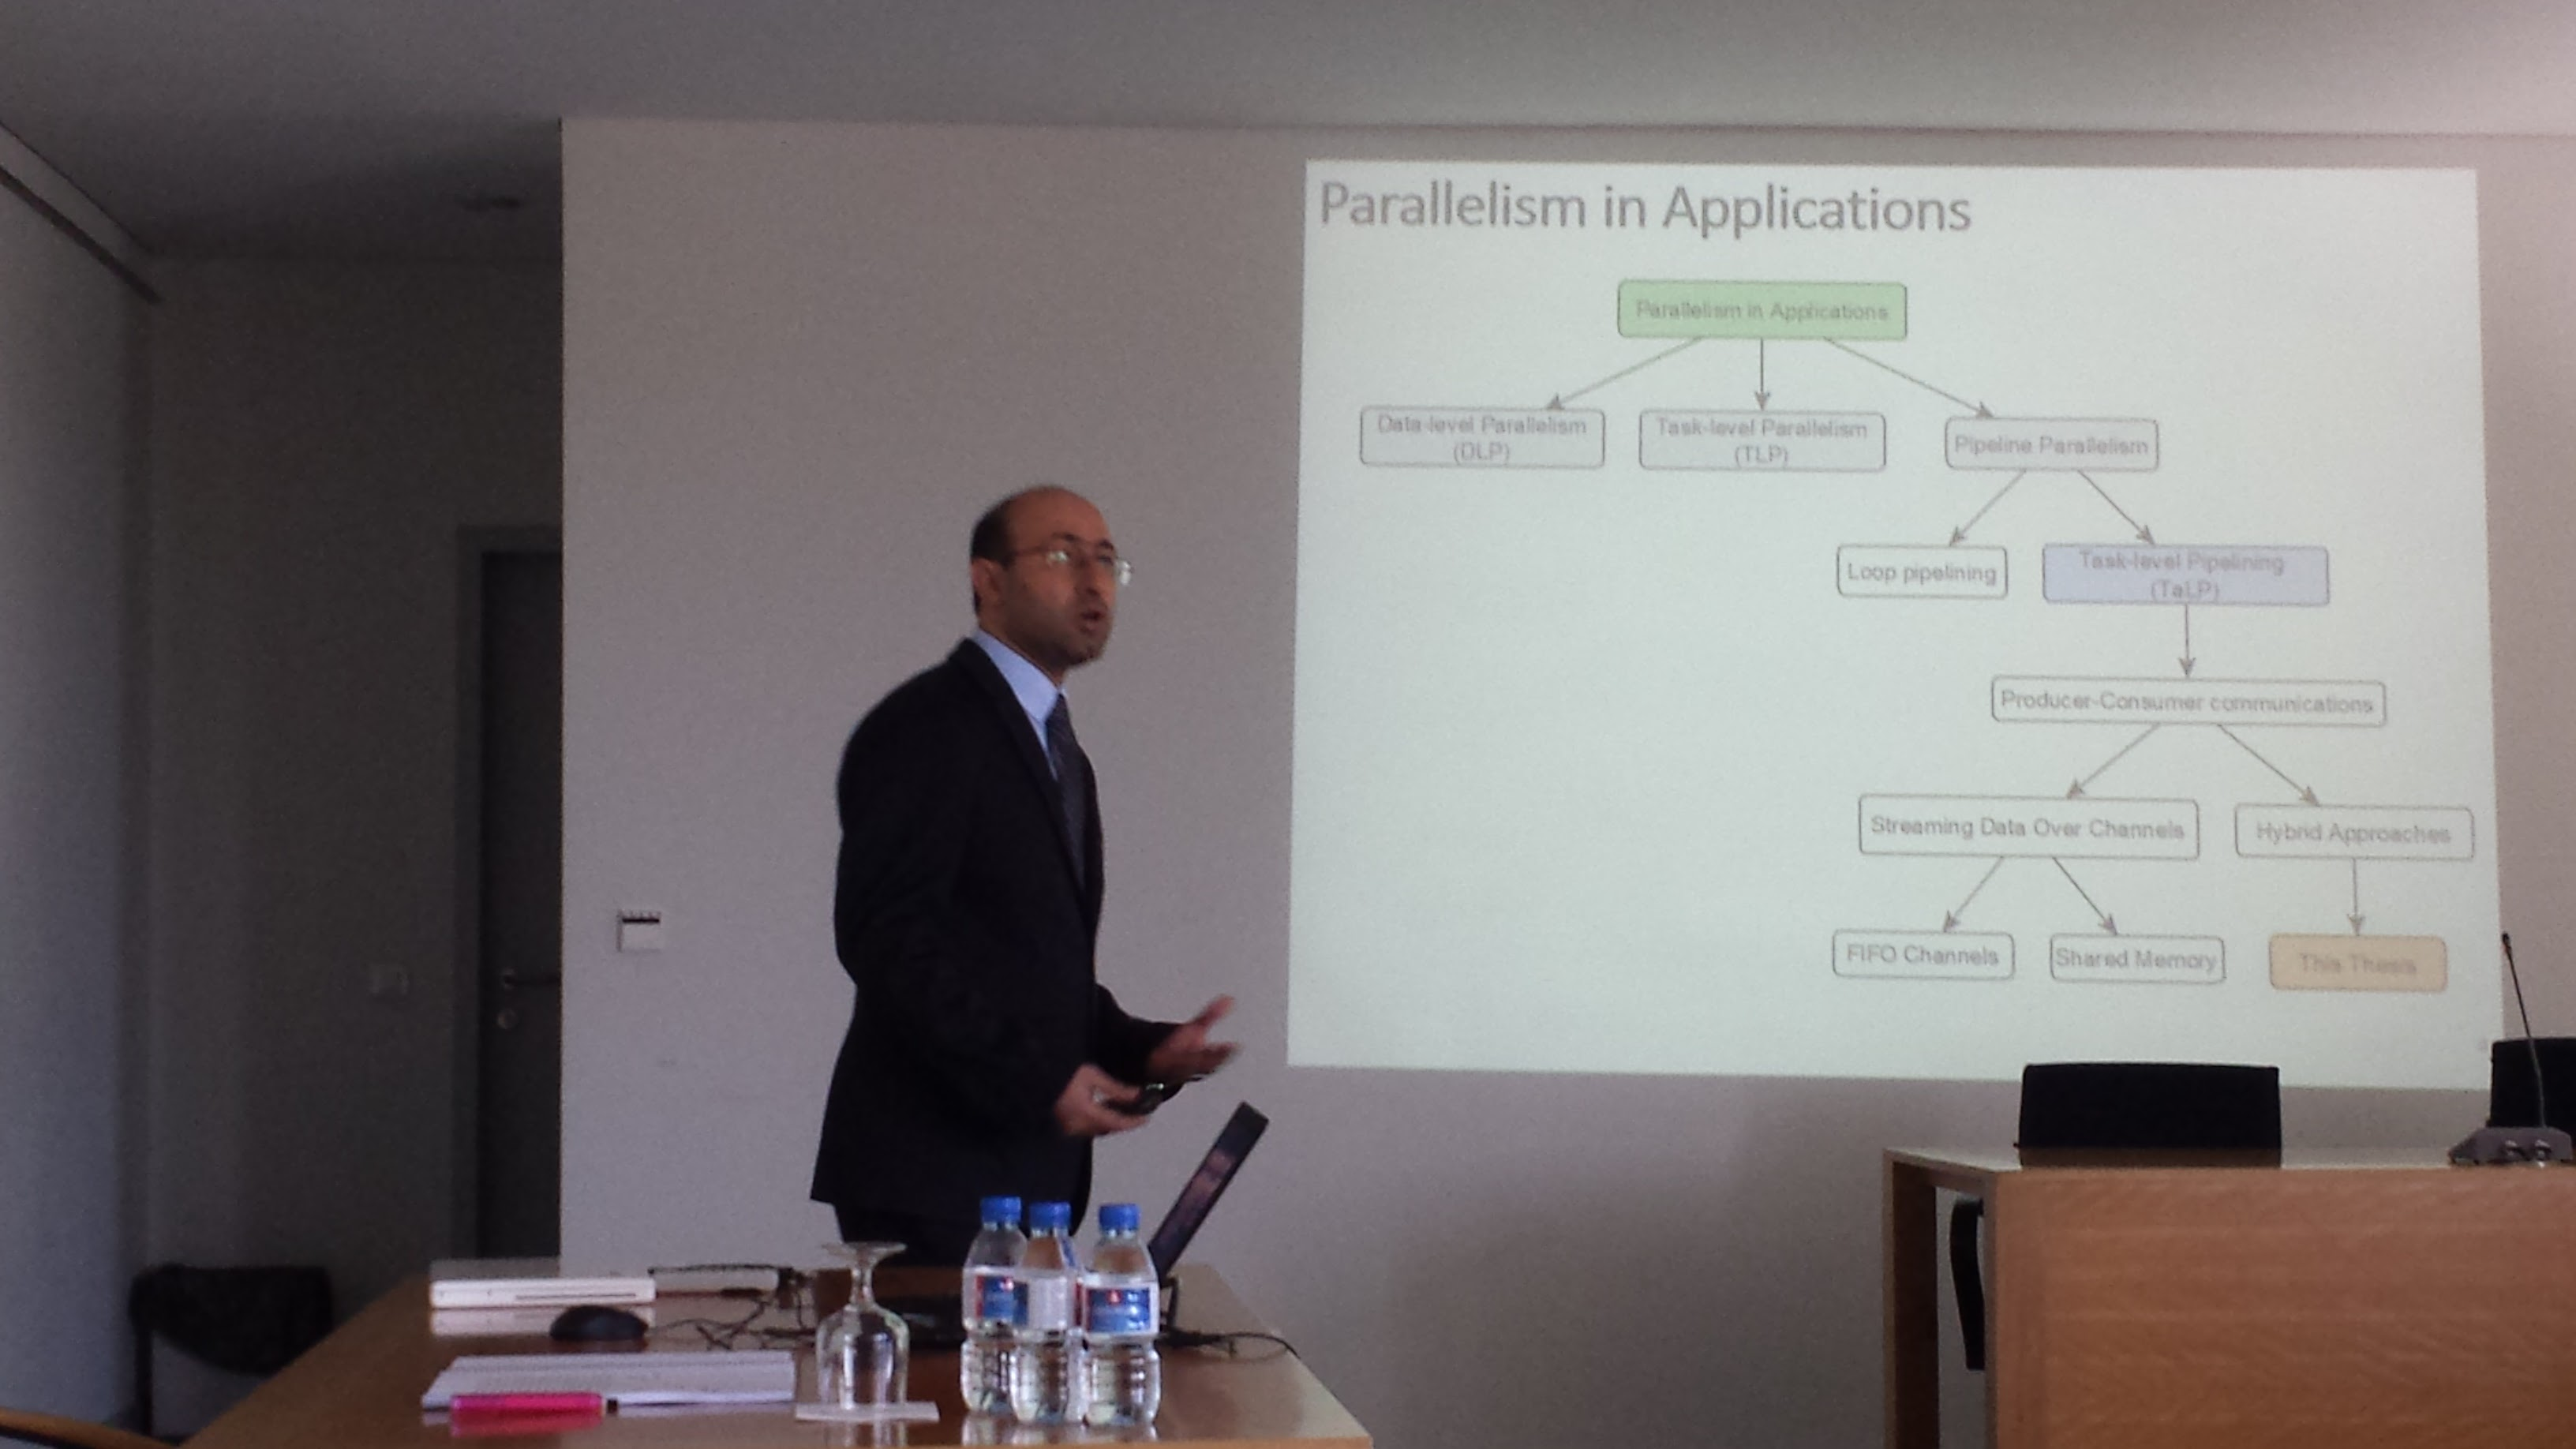 Ali presenting his PhD work